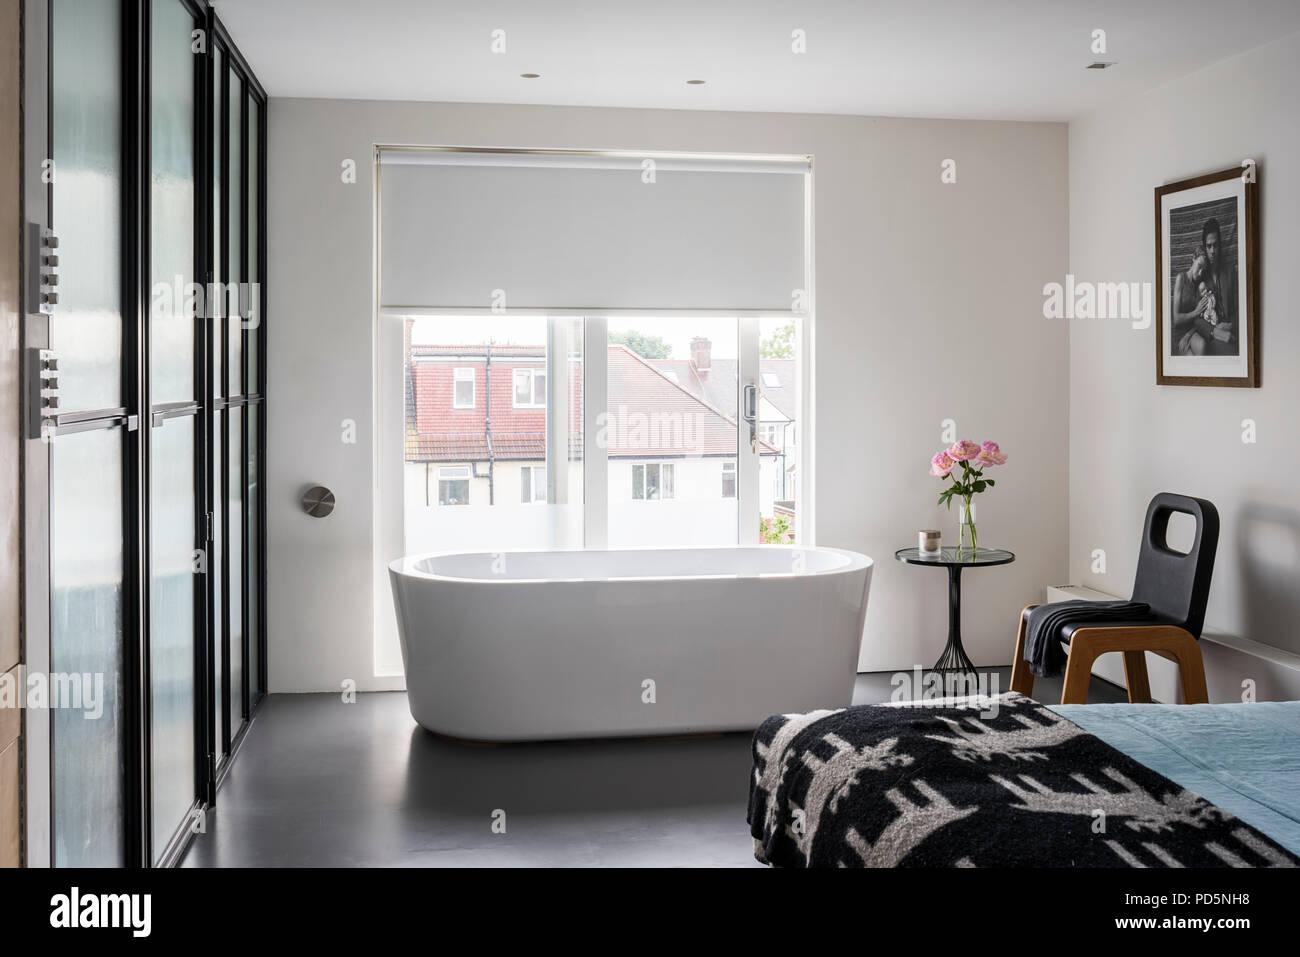 Bath tub in minimal bedroom - Stock Image